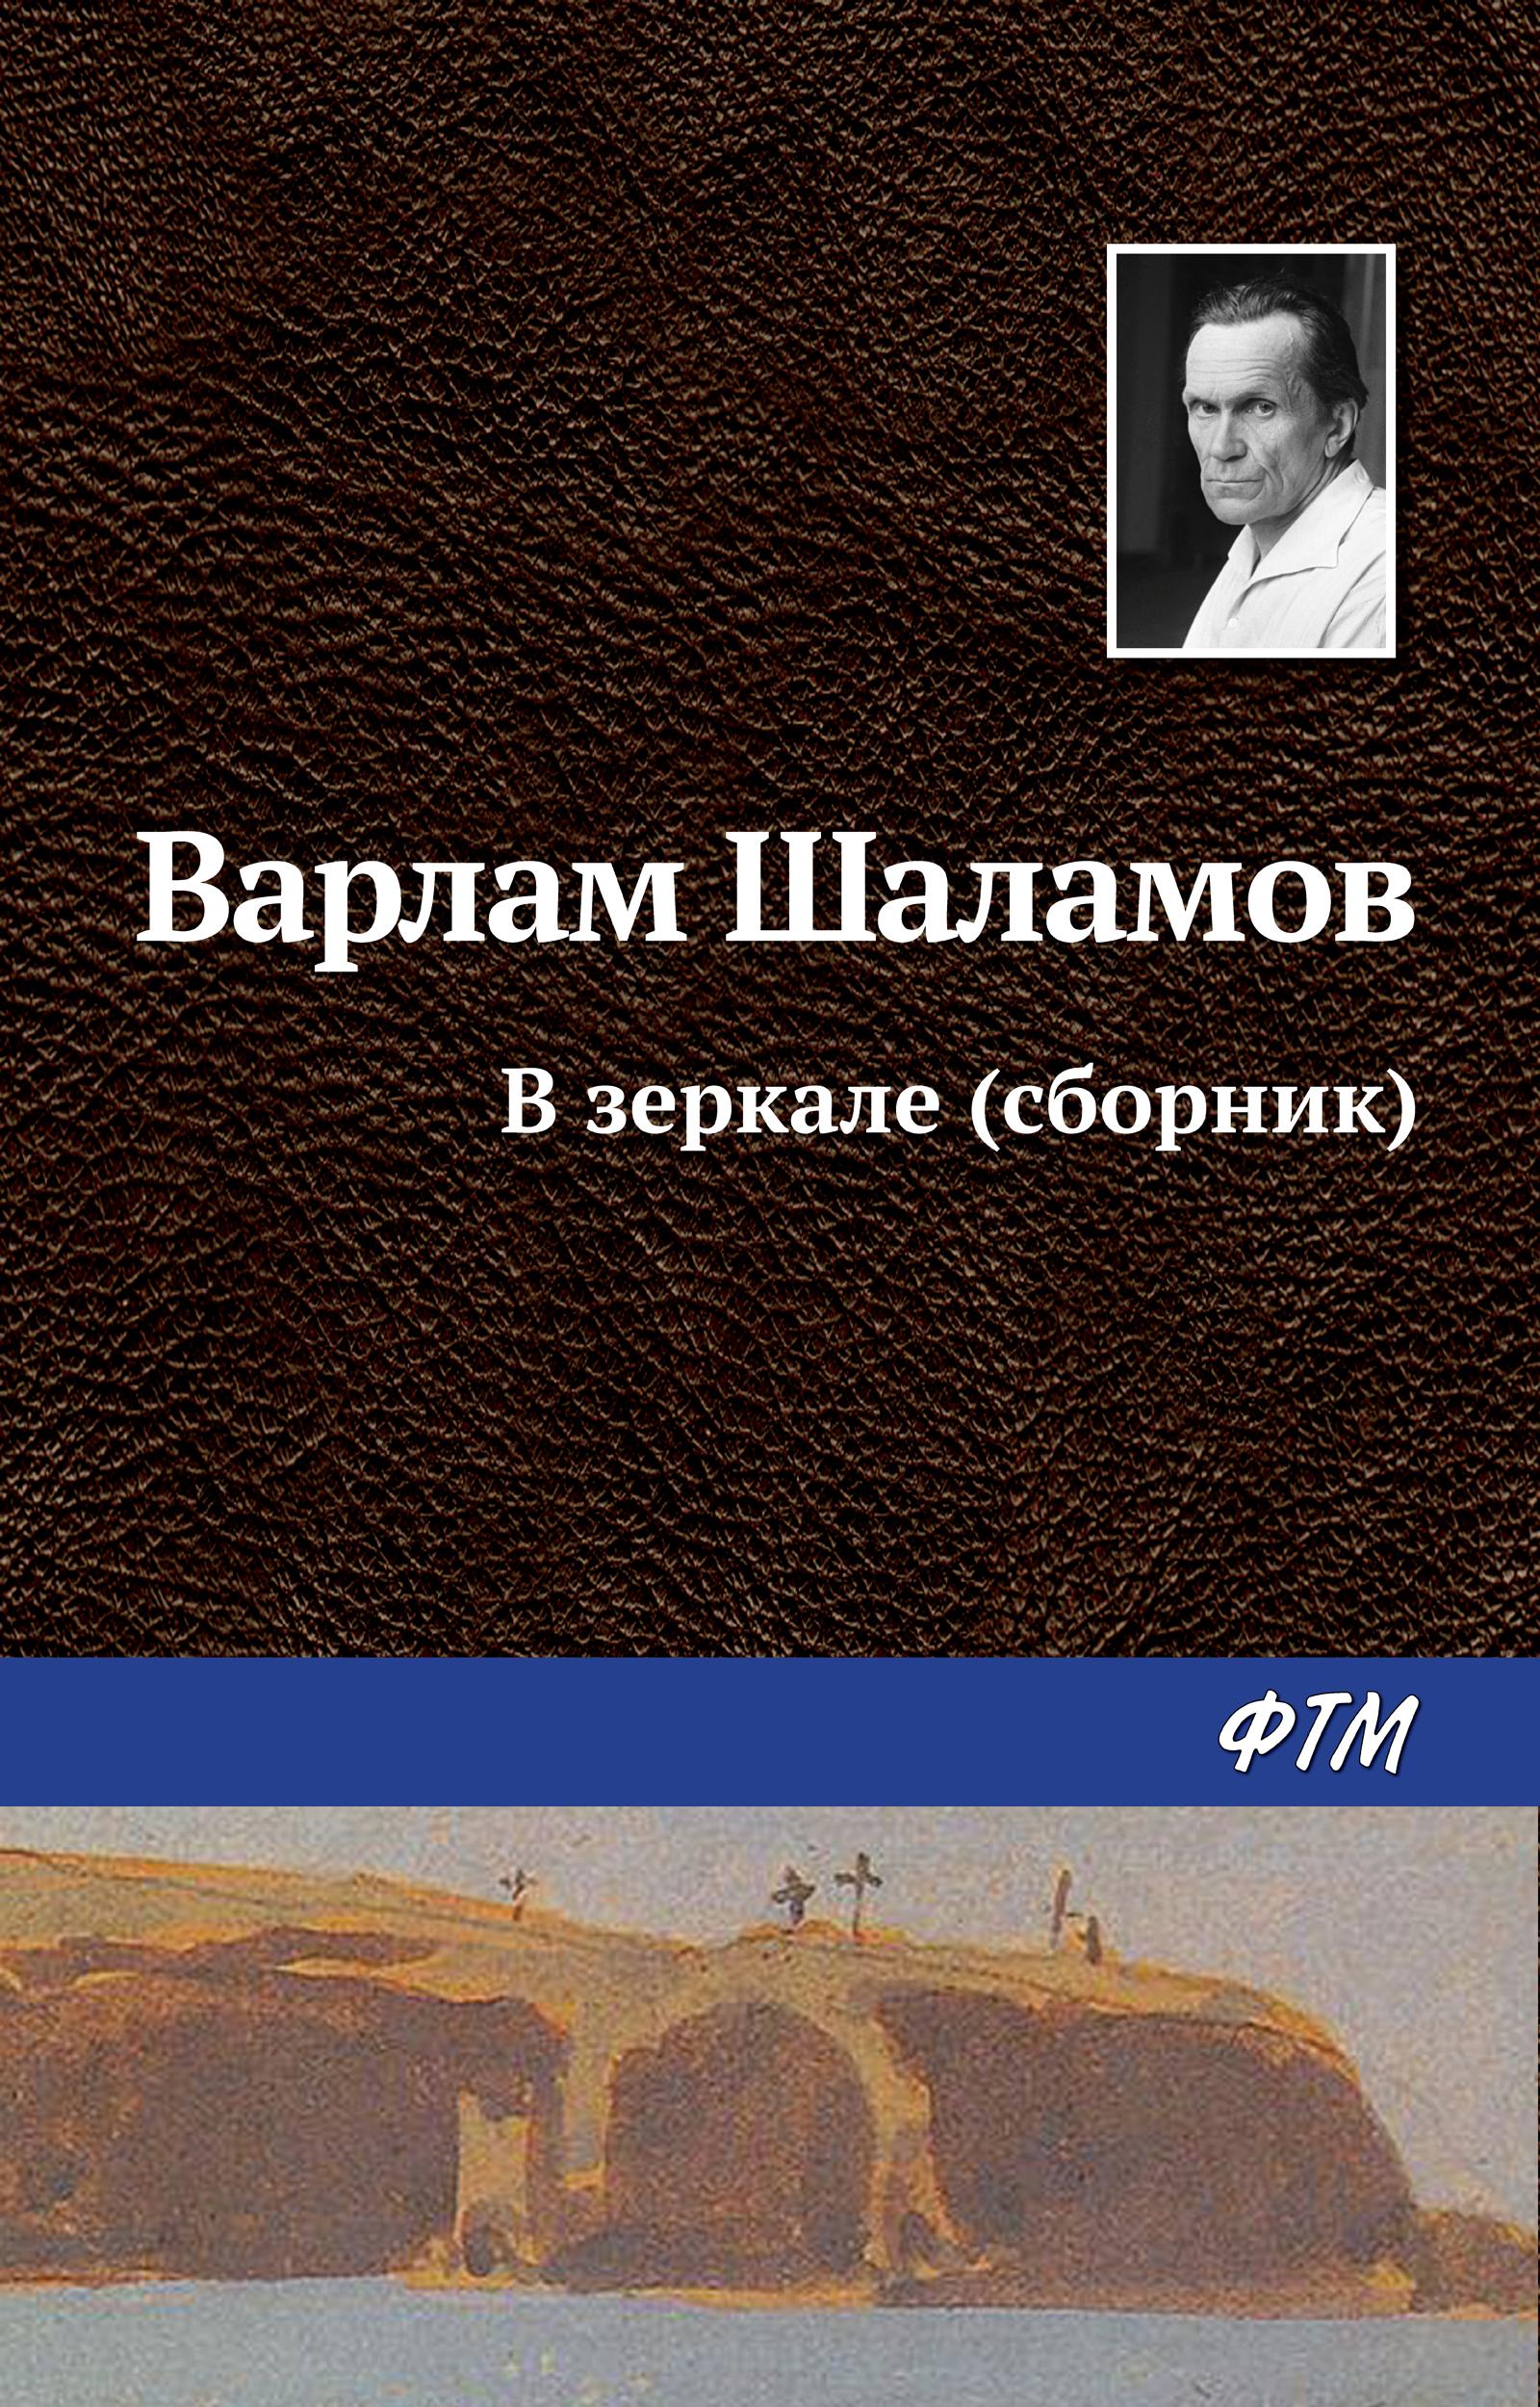 Варлам Шаламов В зеркале (сборник) варлам шаламов тифозный карантин